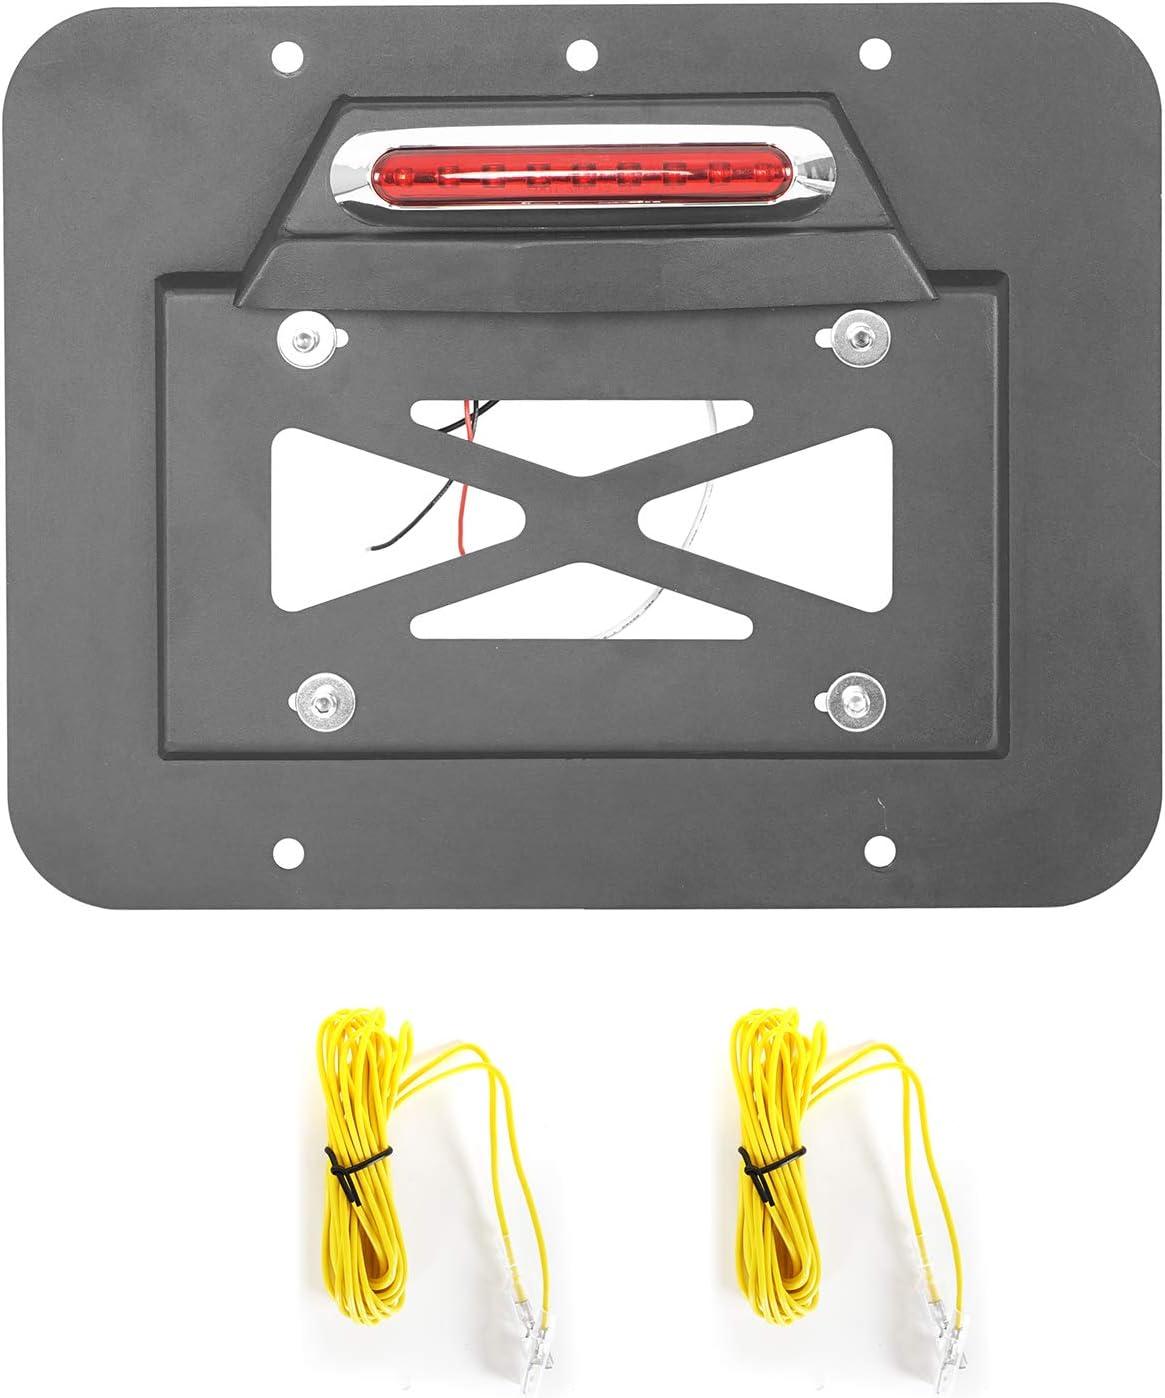 u-Box Jeep Wrangler TJ 97-06 Spare Tire Delete License Plate Relocation Kit w//Plate Illuminate Light /& Third Brake Light